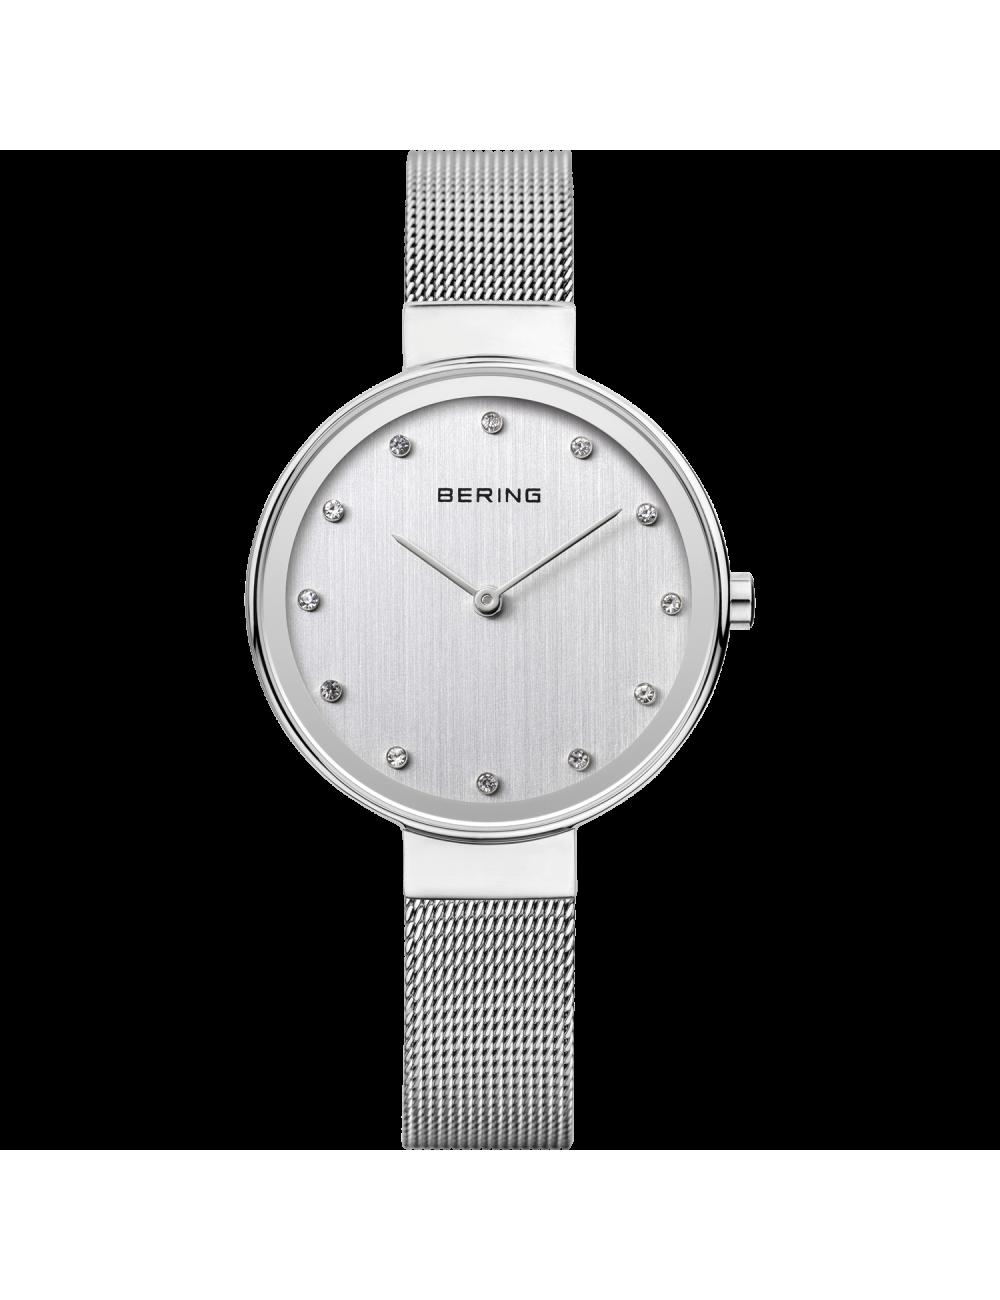 Bering -Bering Classic mujer plateado -12034-000